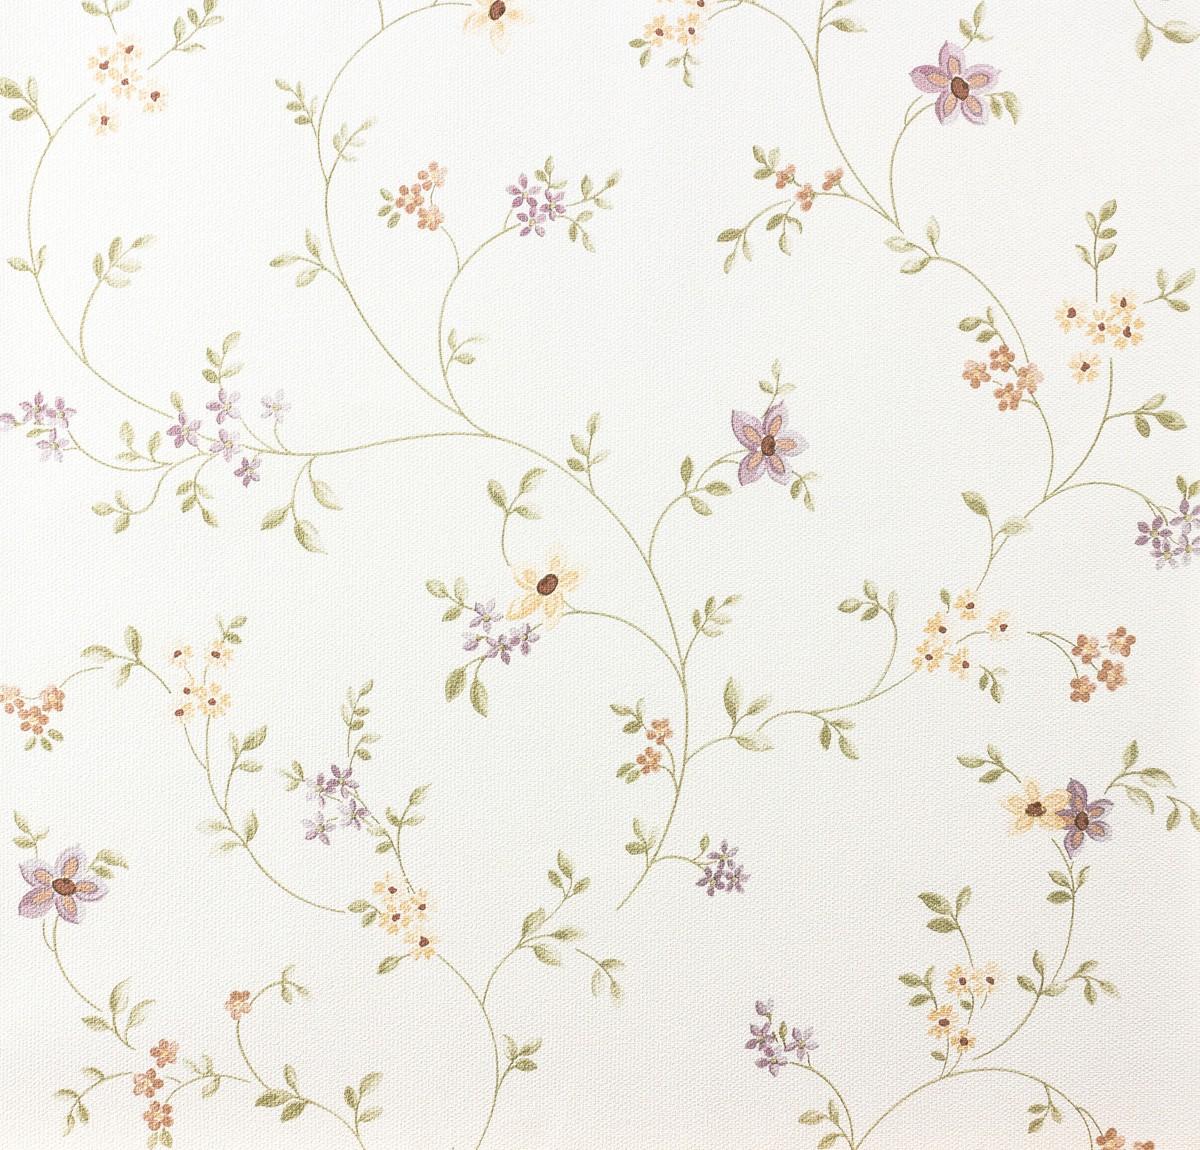 landhaus tapete fleuri pastel a s 93770 1 937701 blumenranke violett gr n wei. Black Bedroom Furniture Sets. Home Design Ideas